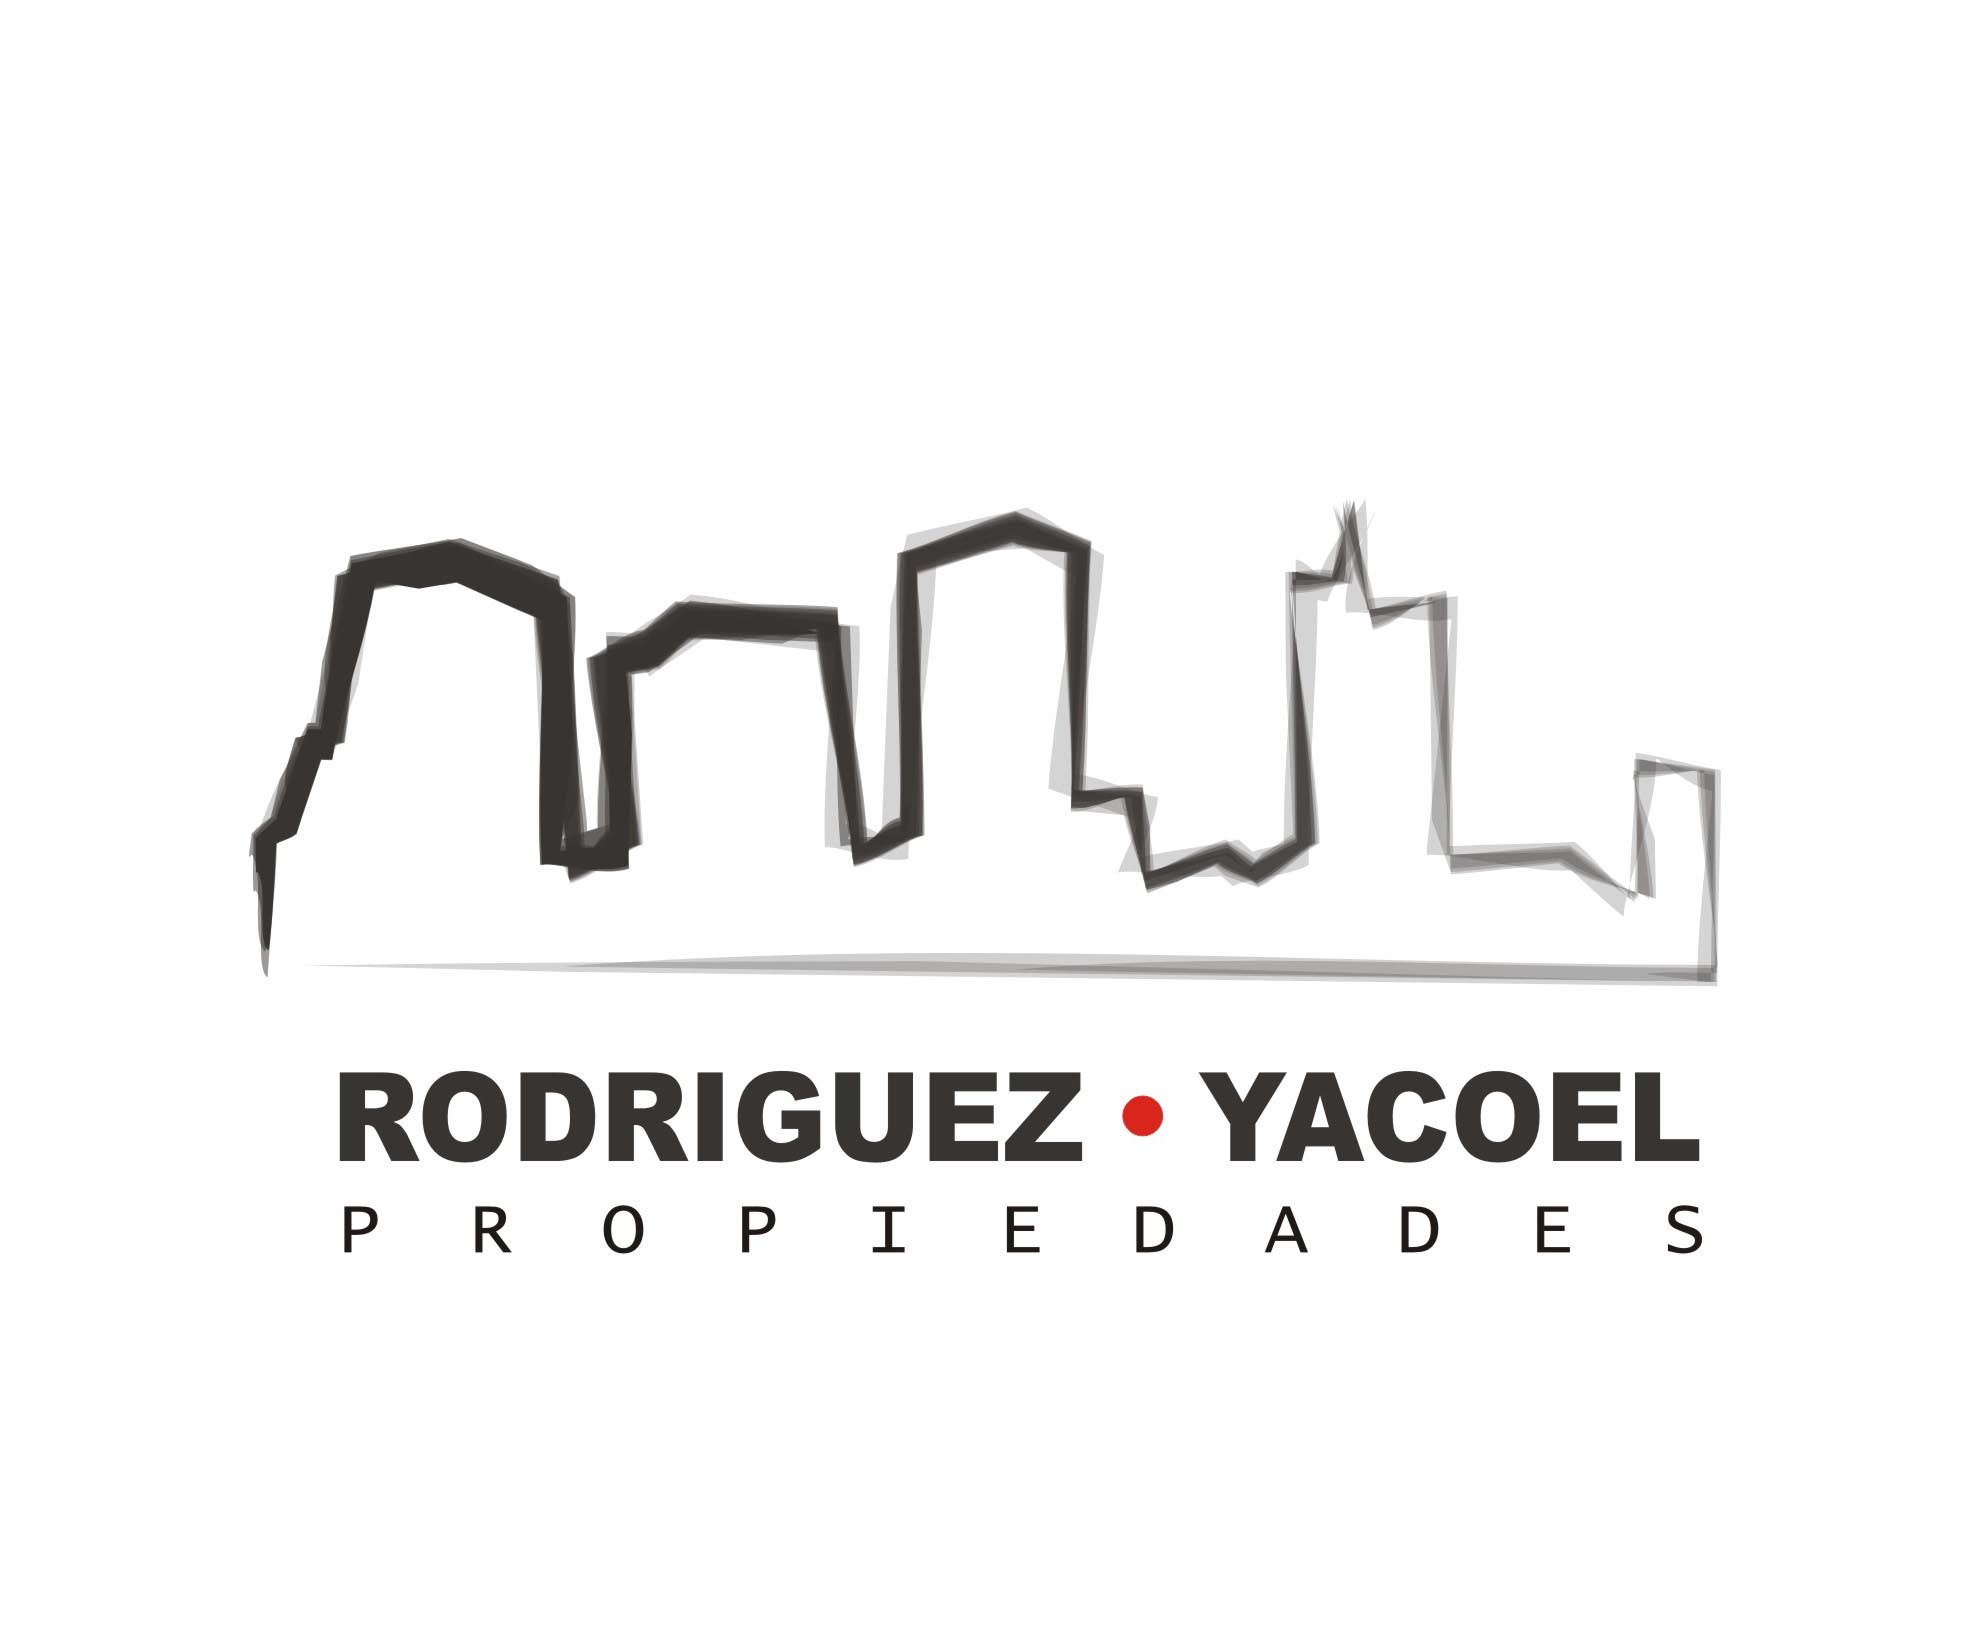 Rodriguez YAcoel